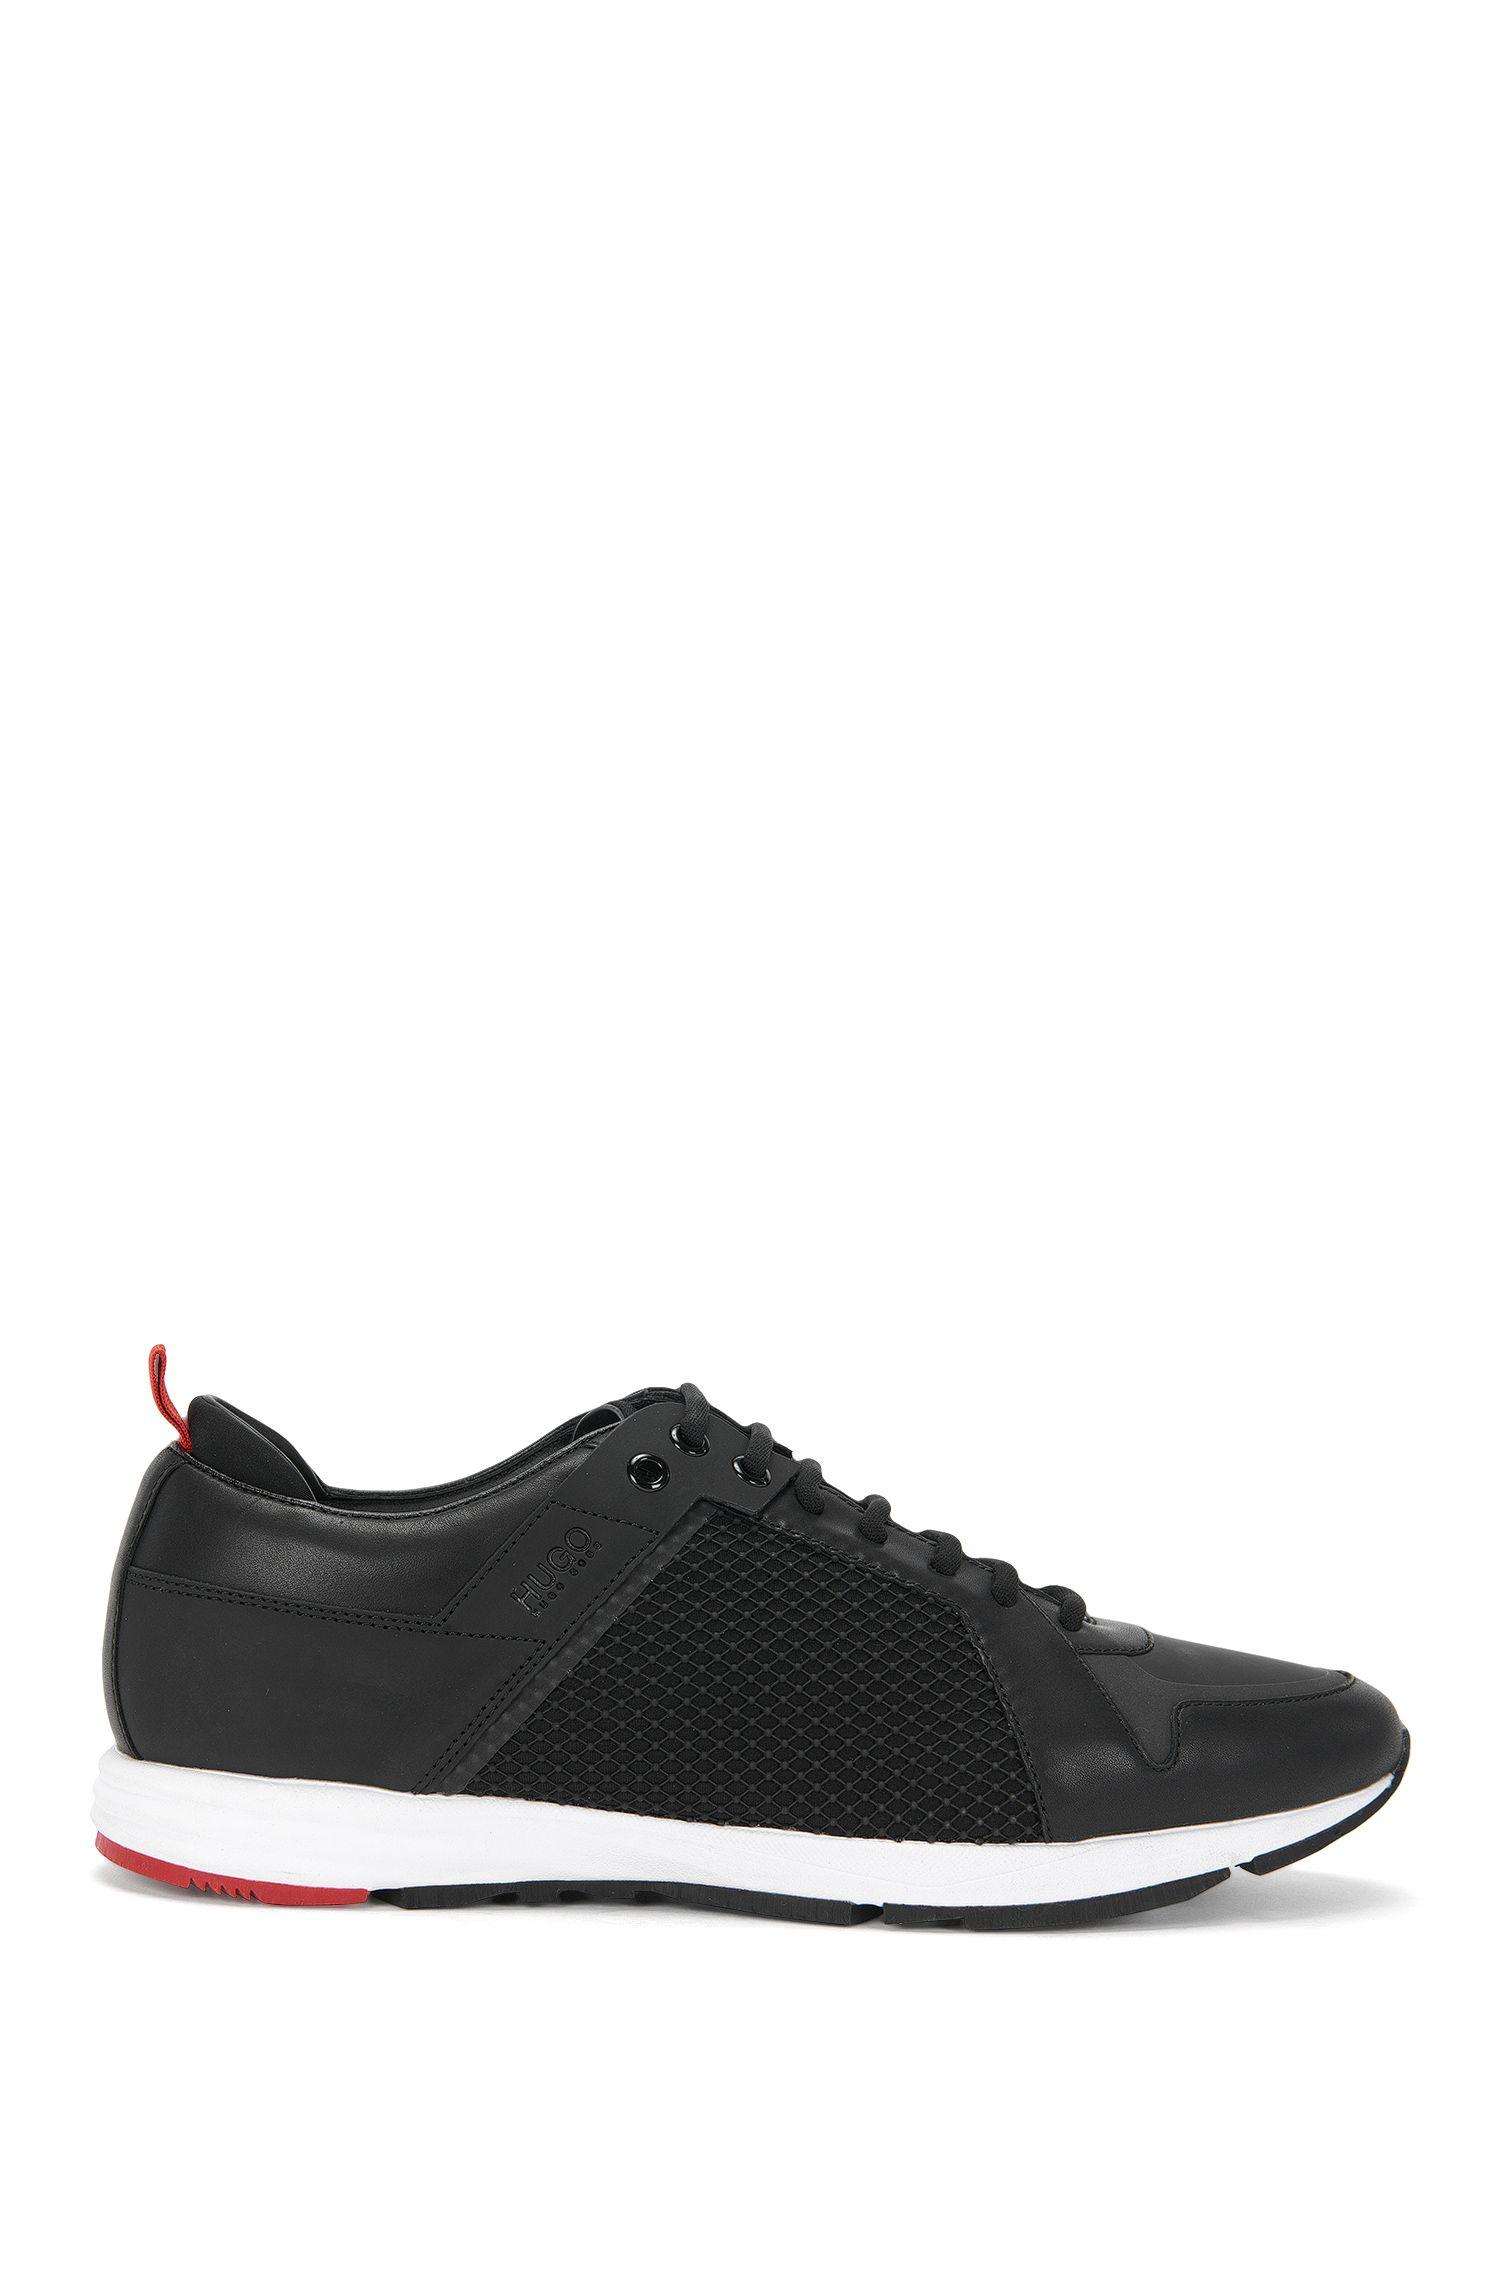 Sneakers aus Leder mit Mesh-Besatz: 'Hybrid_Runn_Itnet'